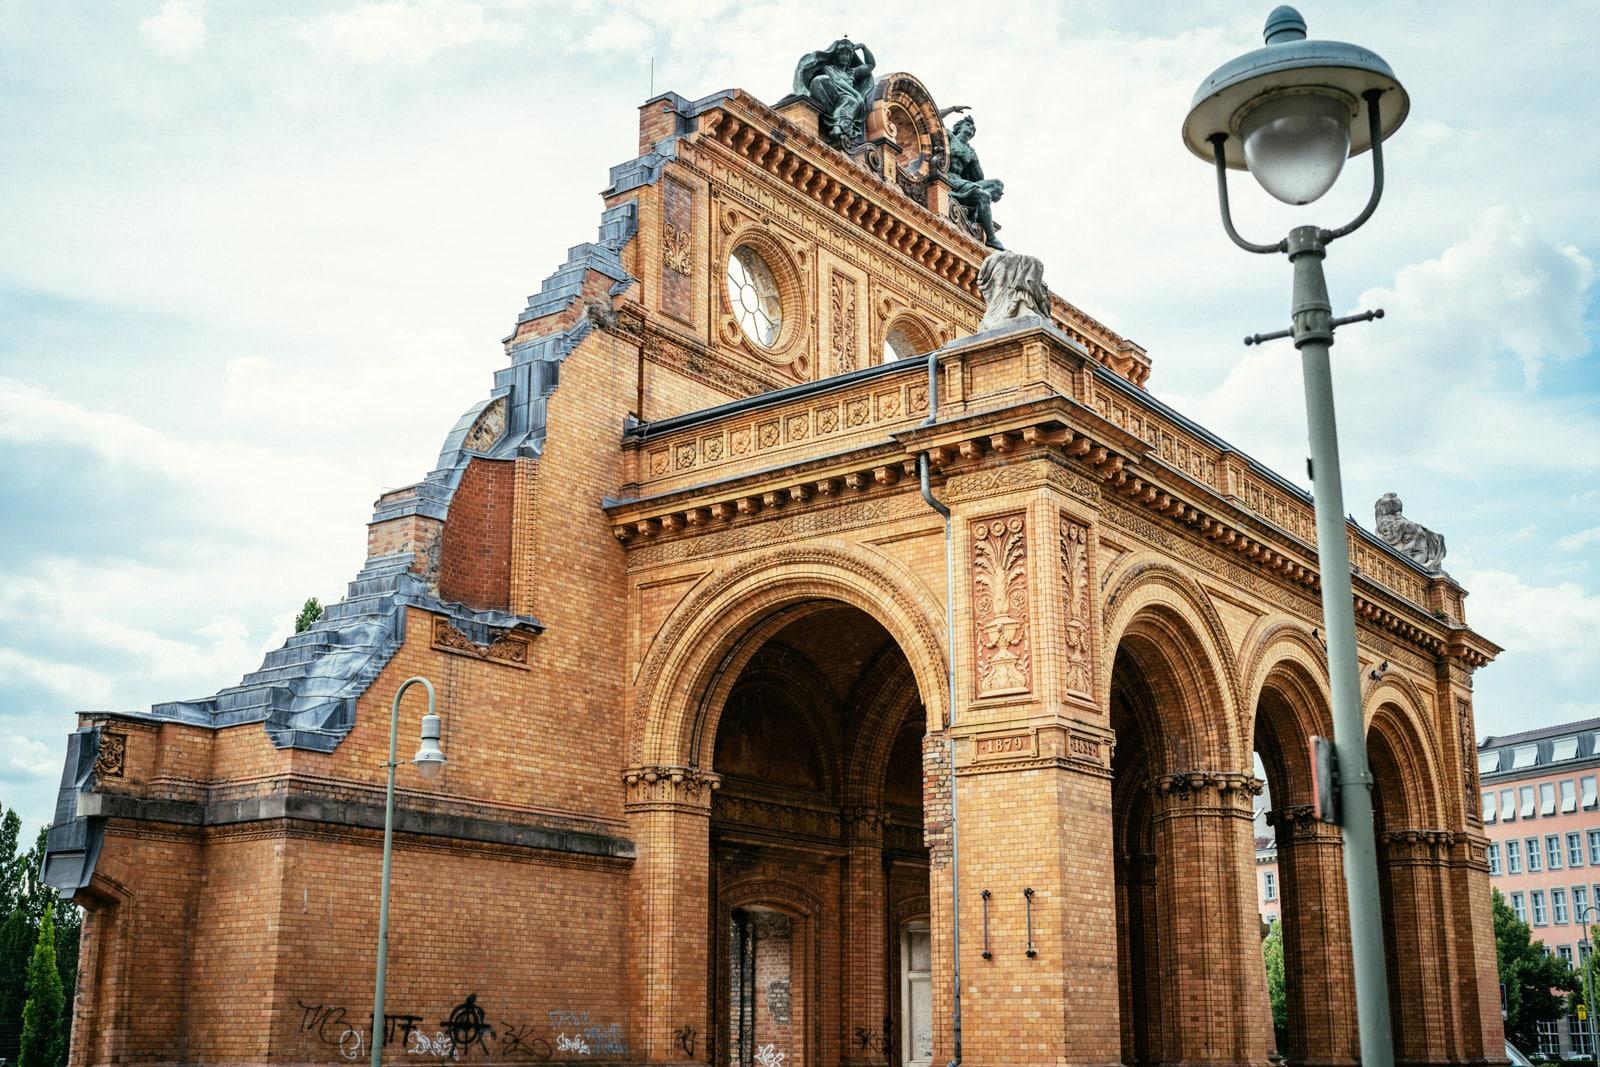 The Ruins of Anhalter Bahnhof